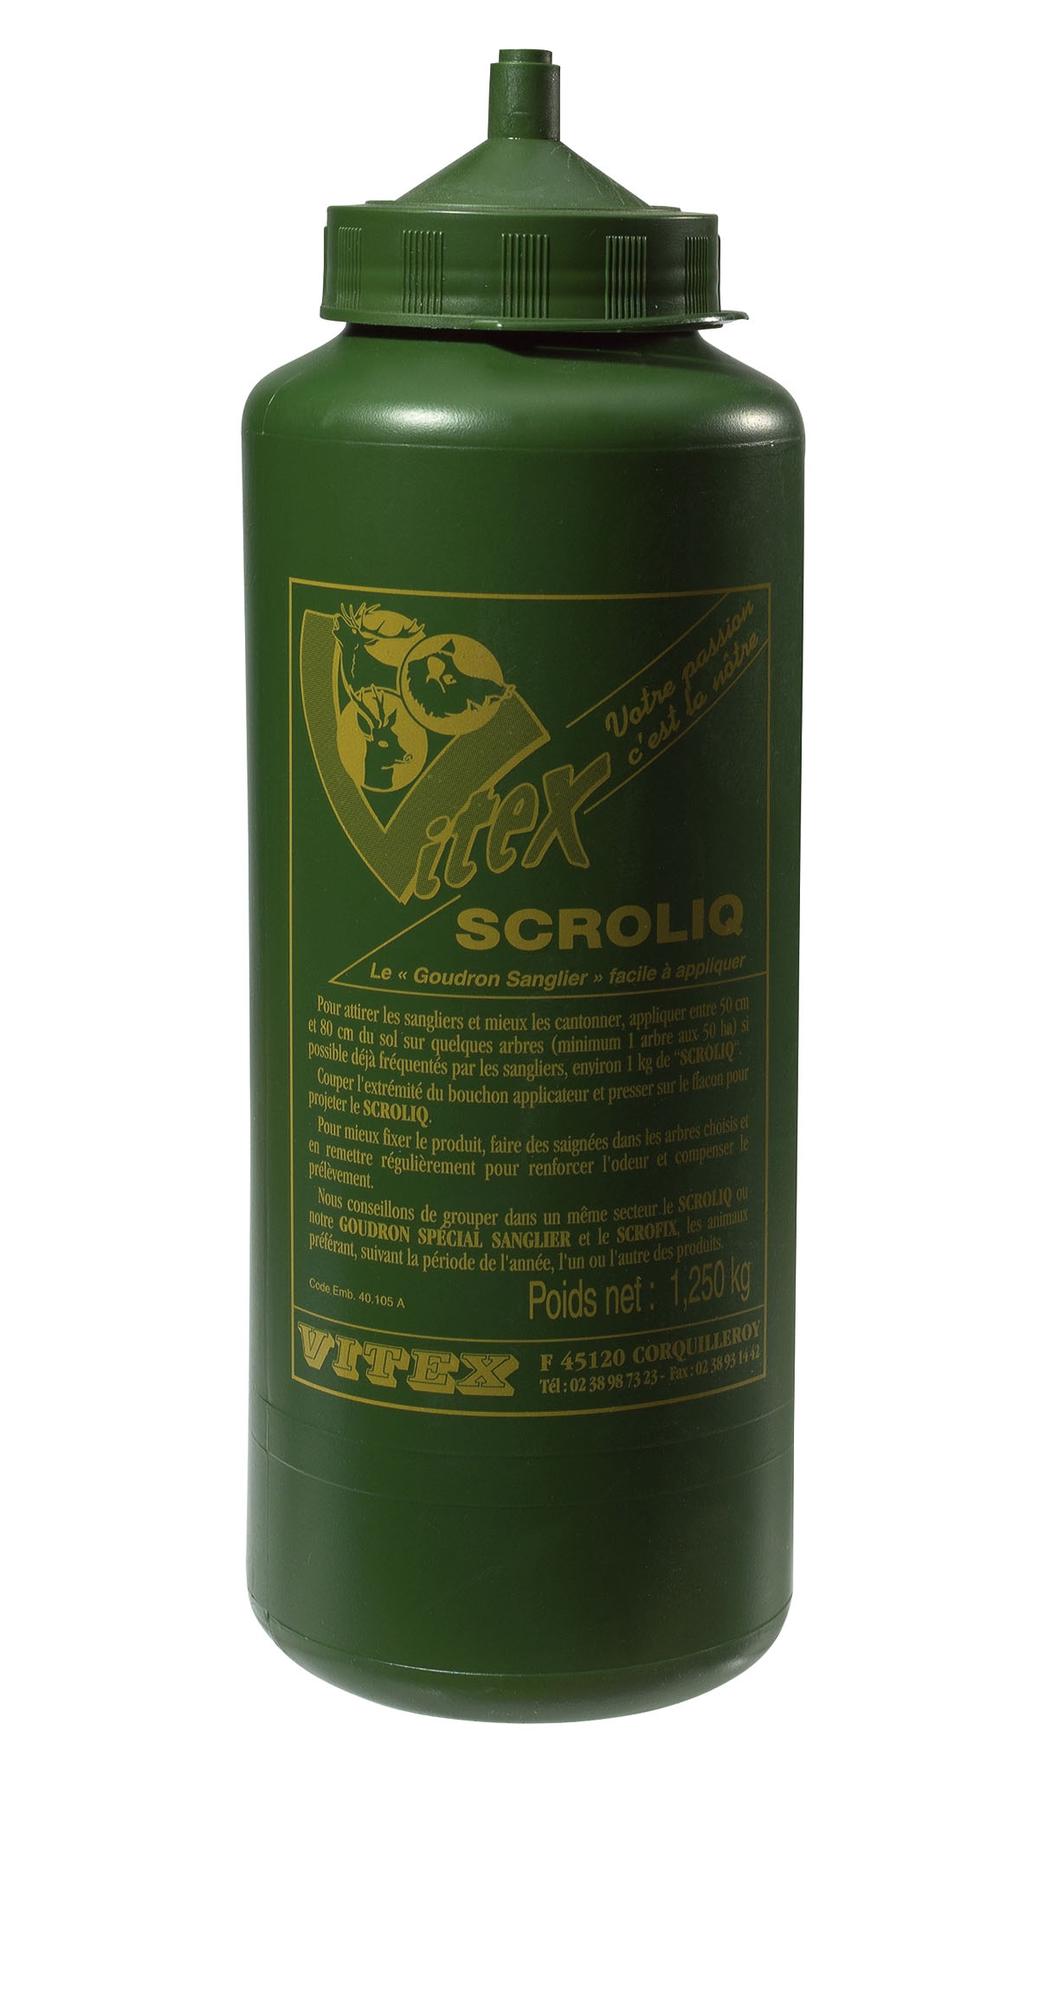 Scroliq